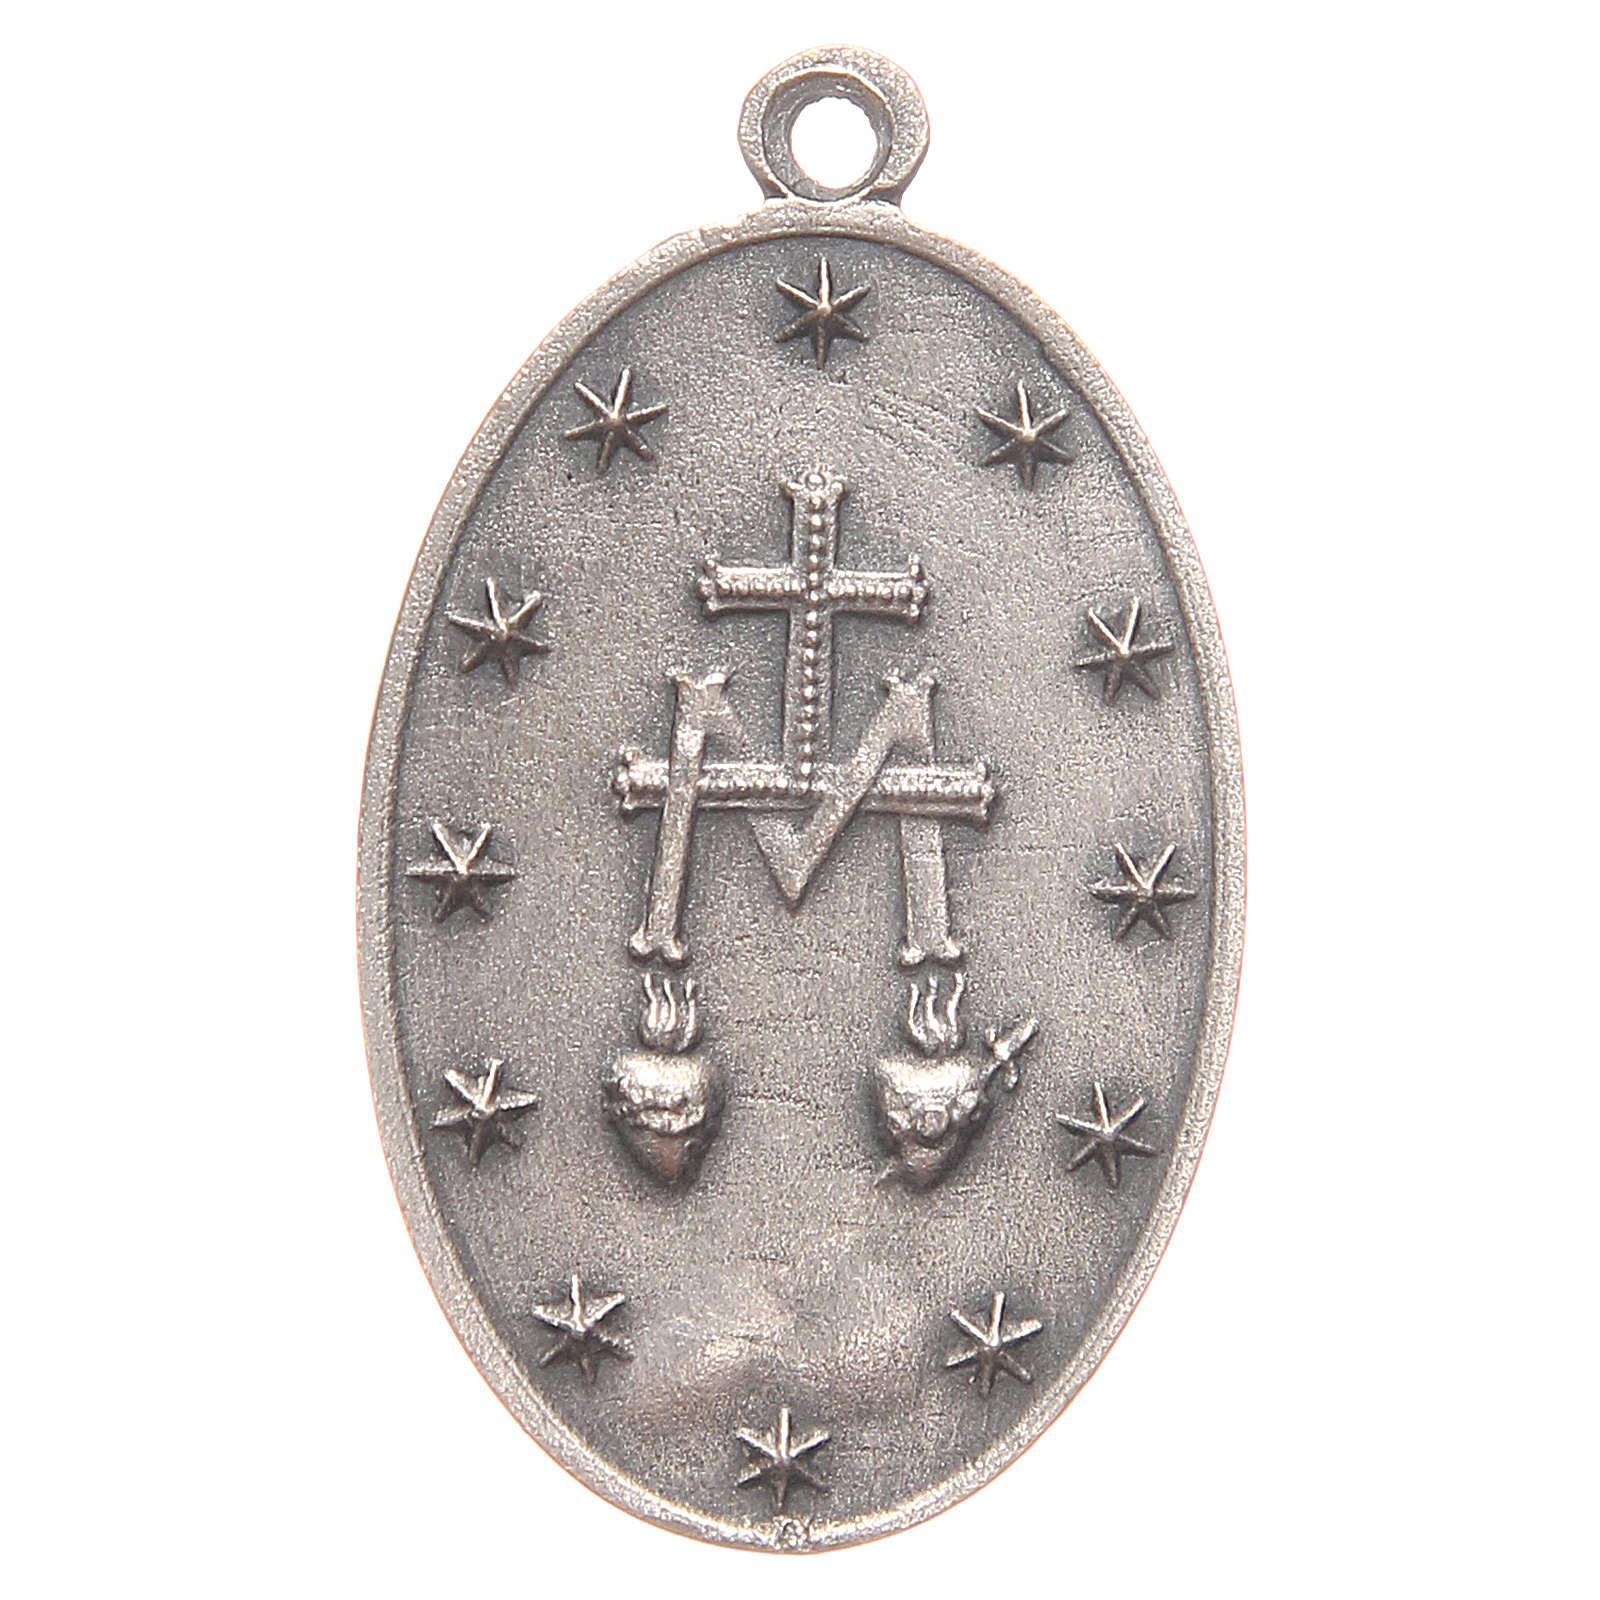 Miraculous Medal measuring 3.2cm 4